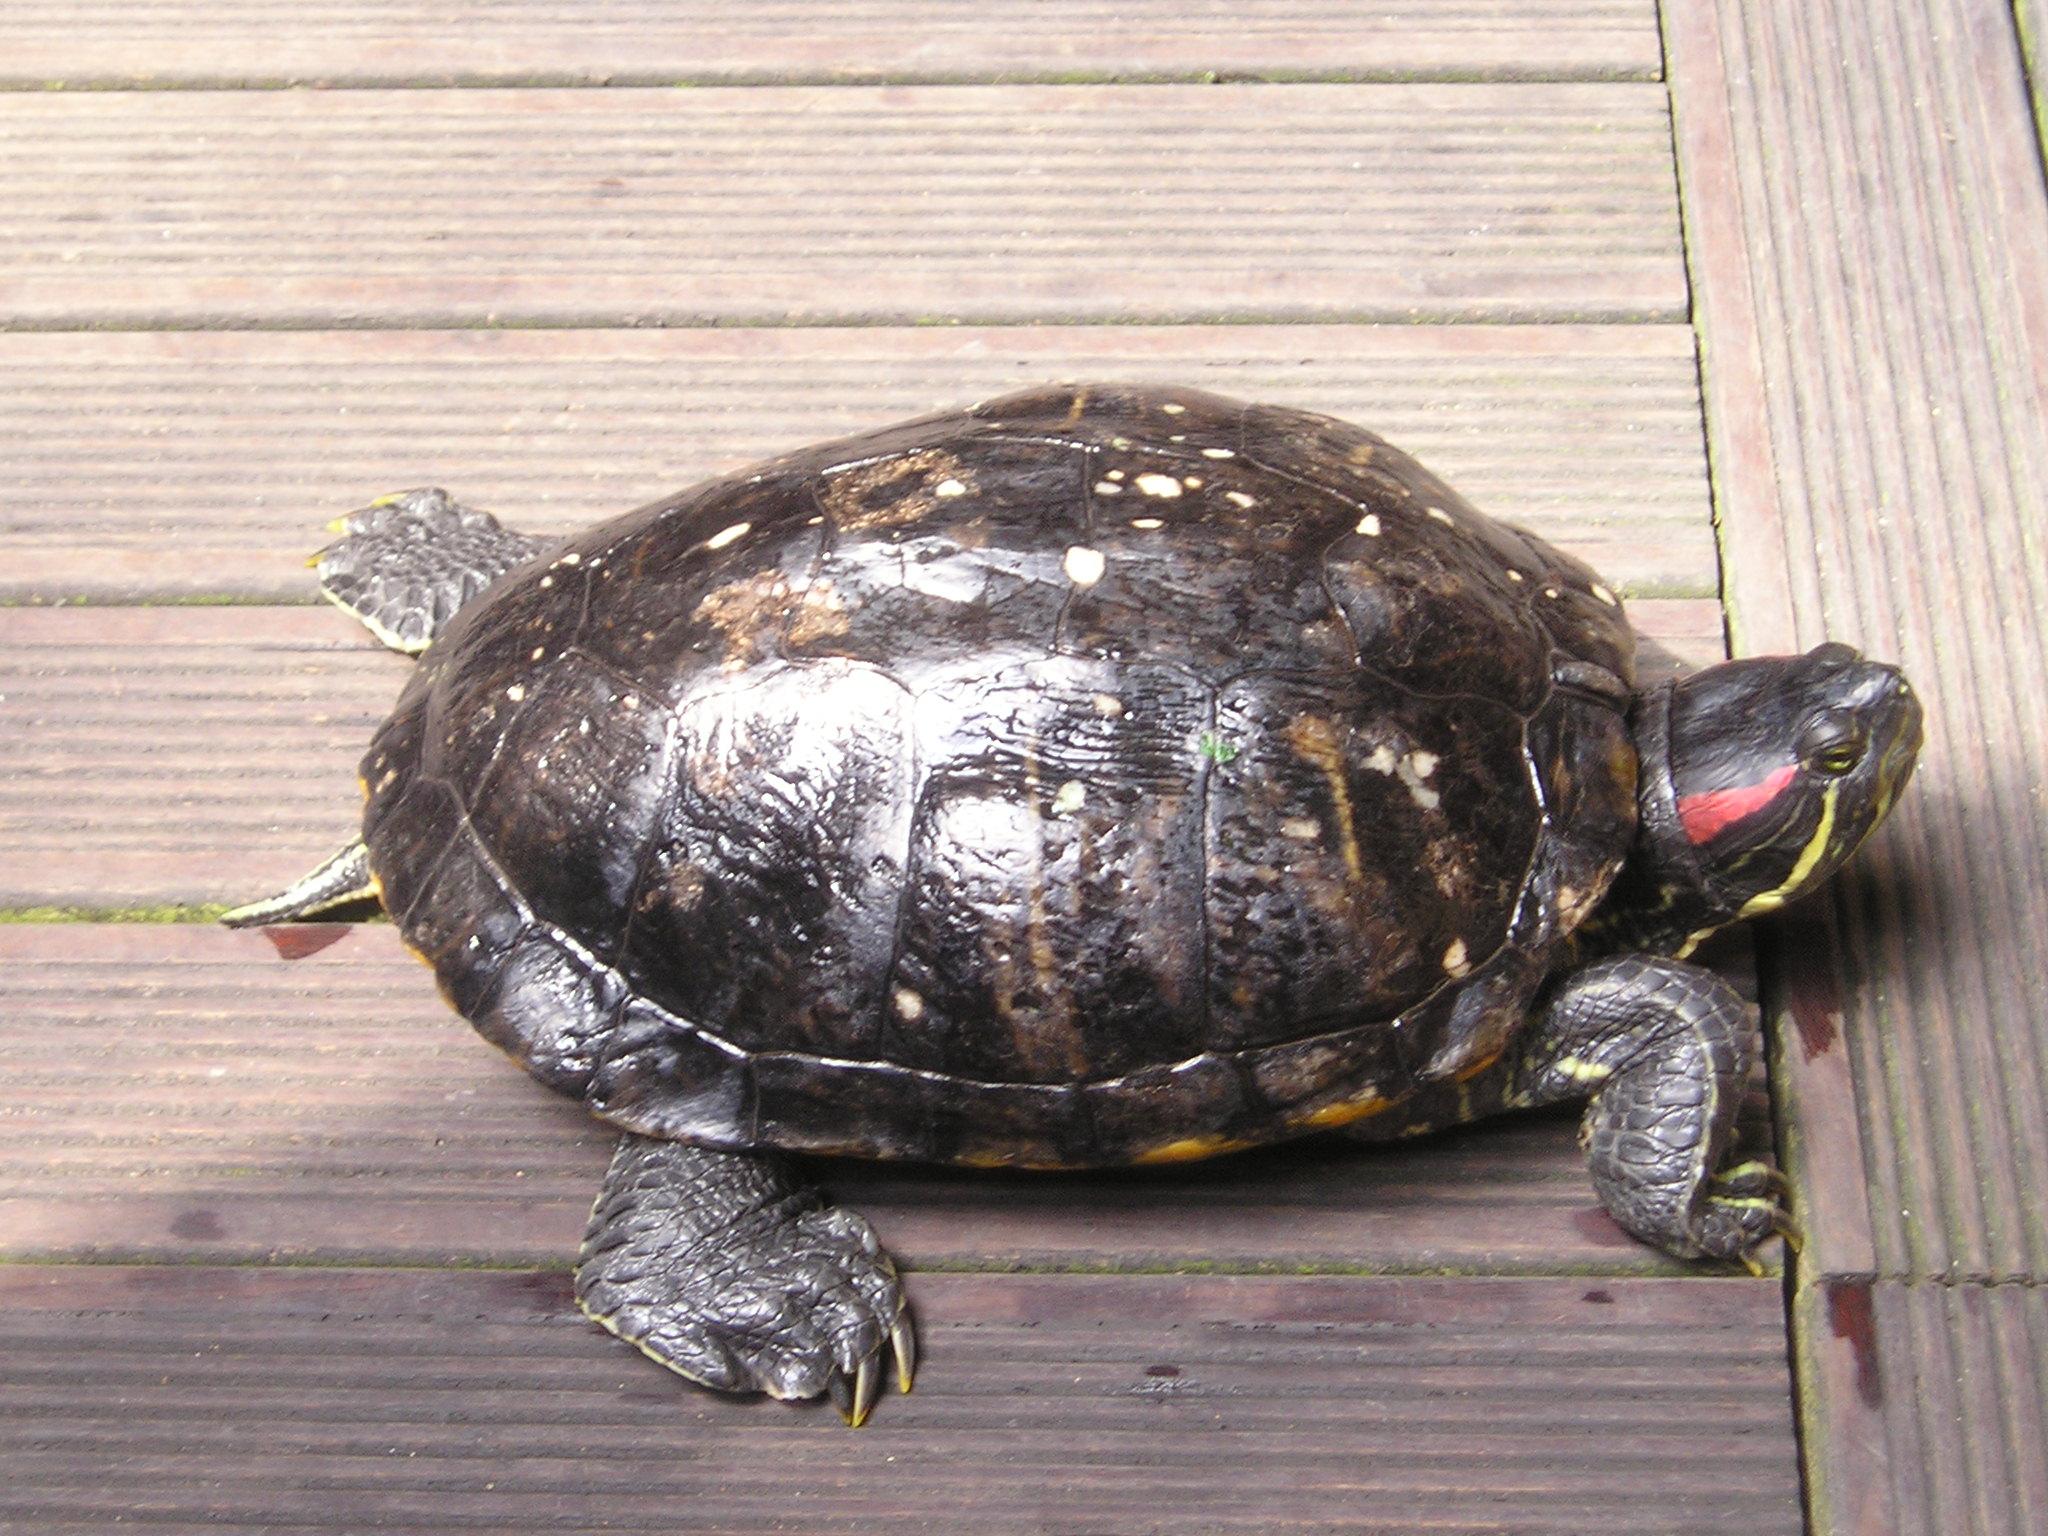 Tortue de floride - Bassin tortue floride strasbourg ...